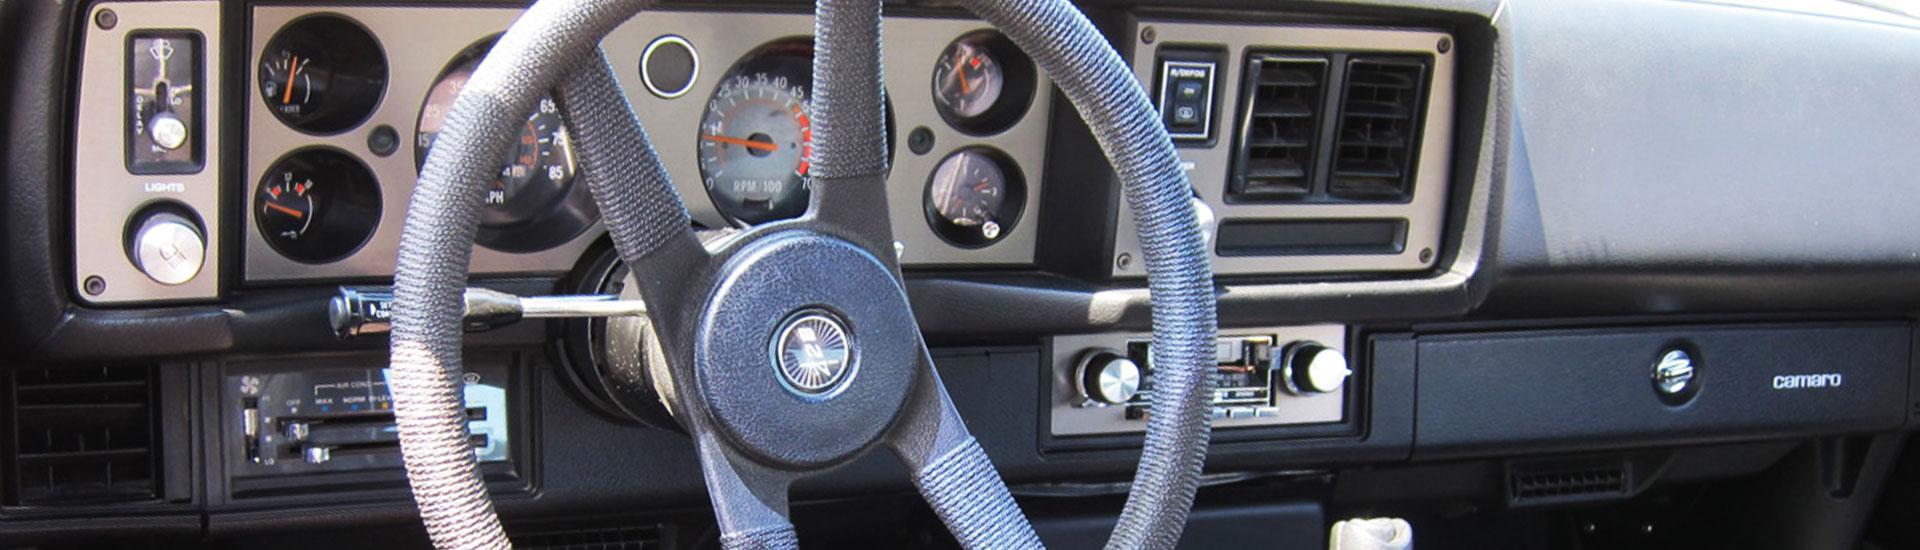 1980 Chevrolet Camaro Dash Kits Custom 1980 Chevrolet